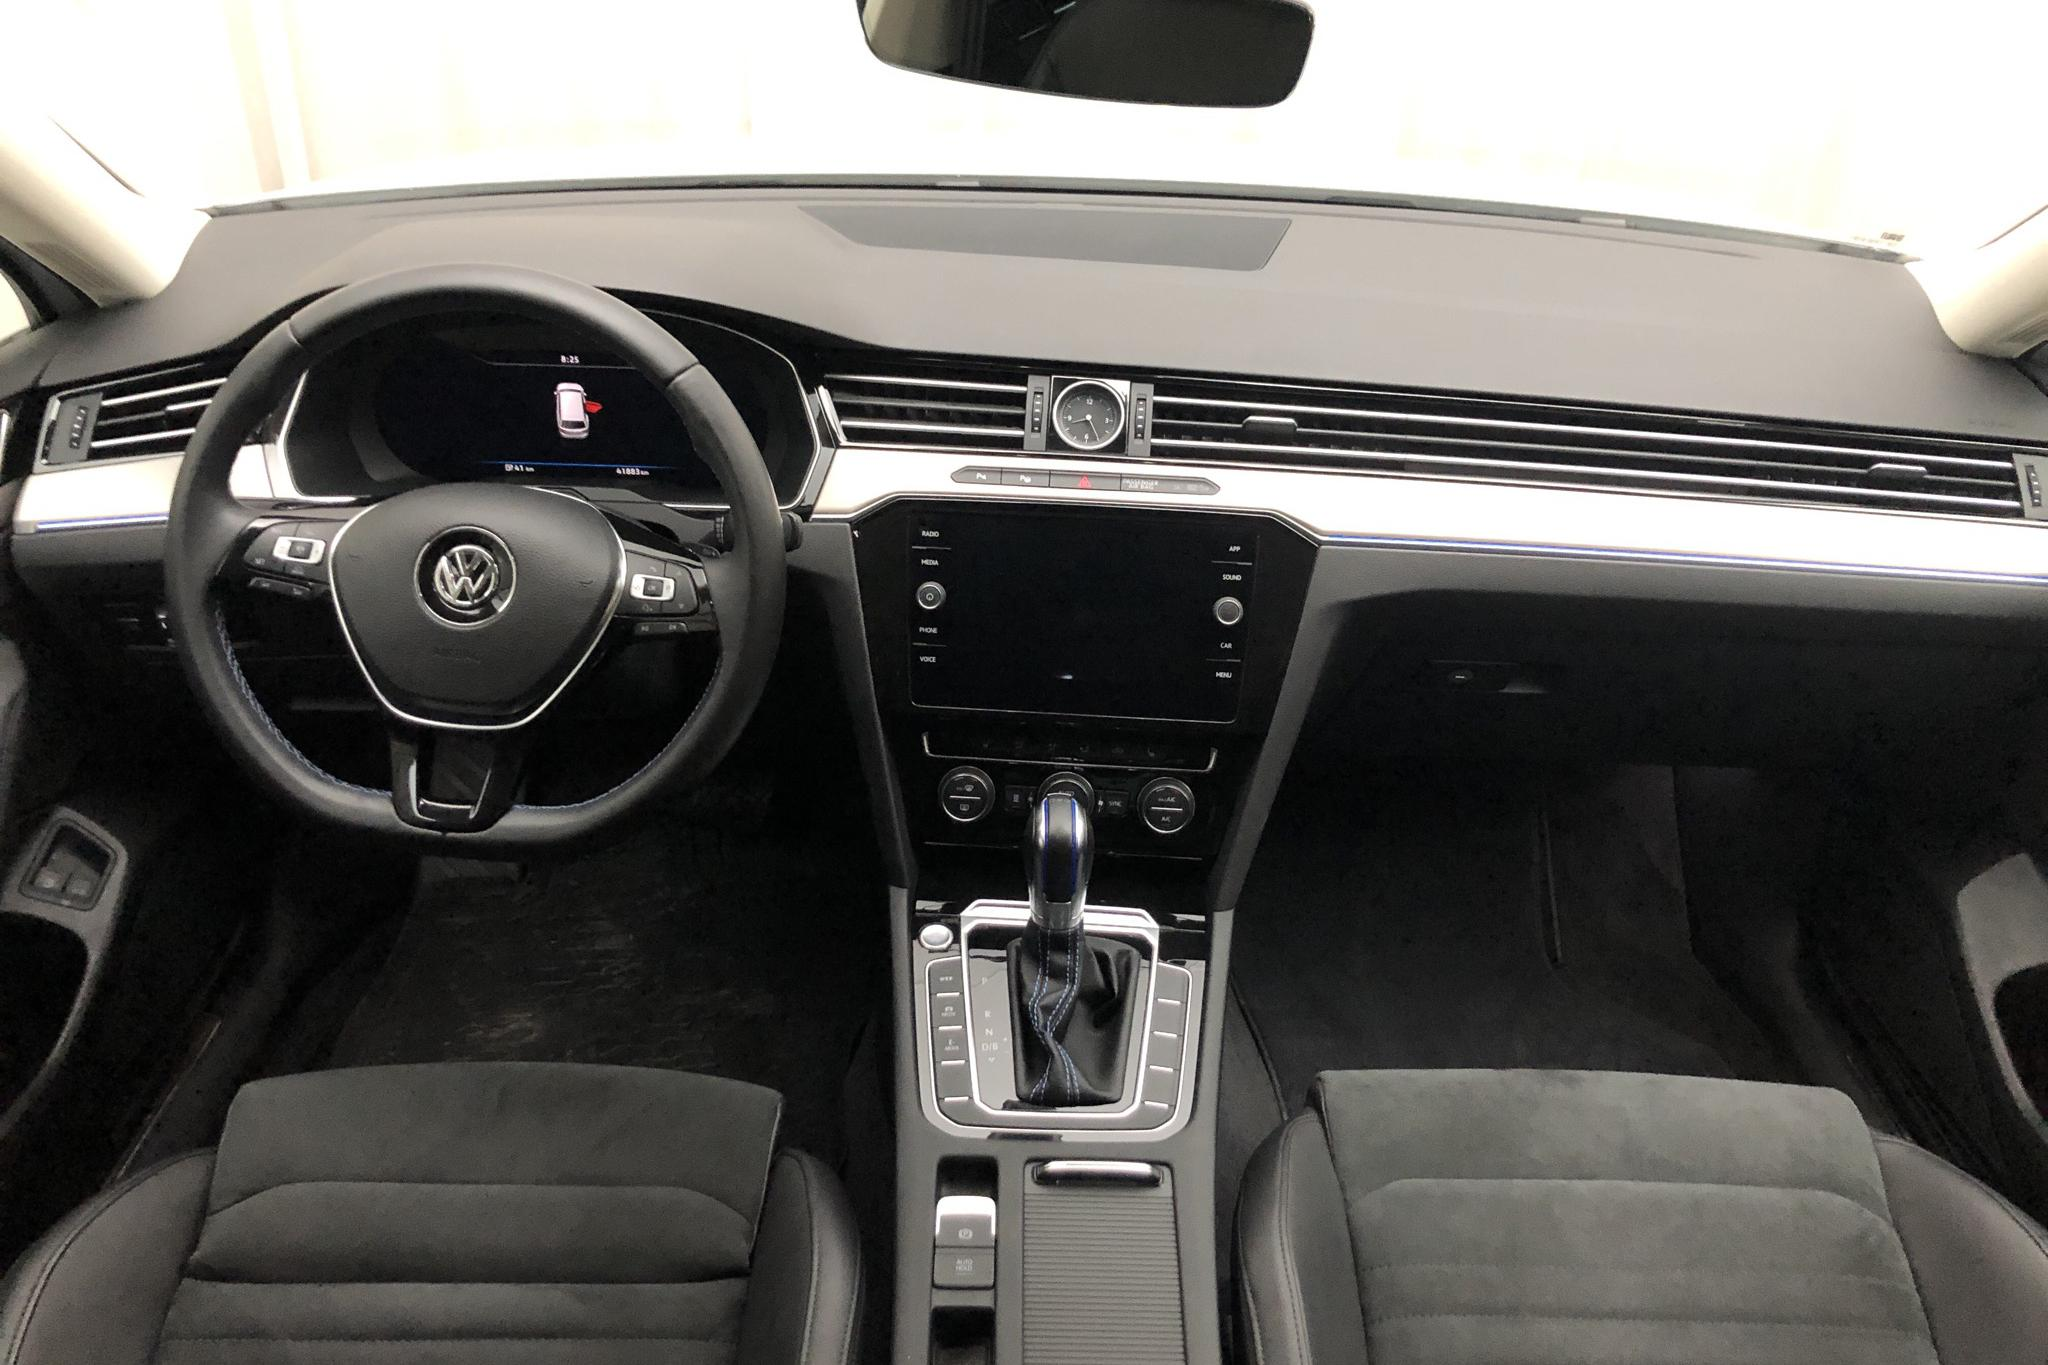 VW Passat 1.4 Plug-in-Hybrid Sportscombi (218hk) - 4 187 mil - Automat - vit - 2018